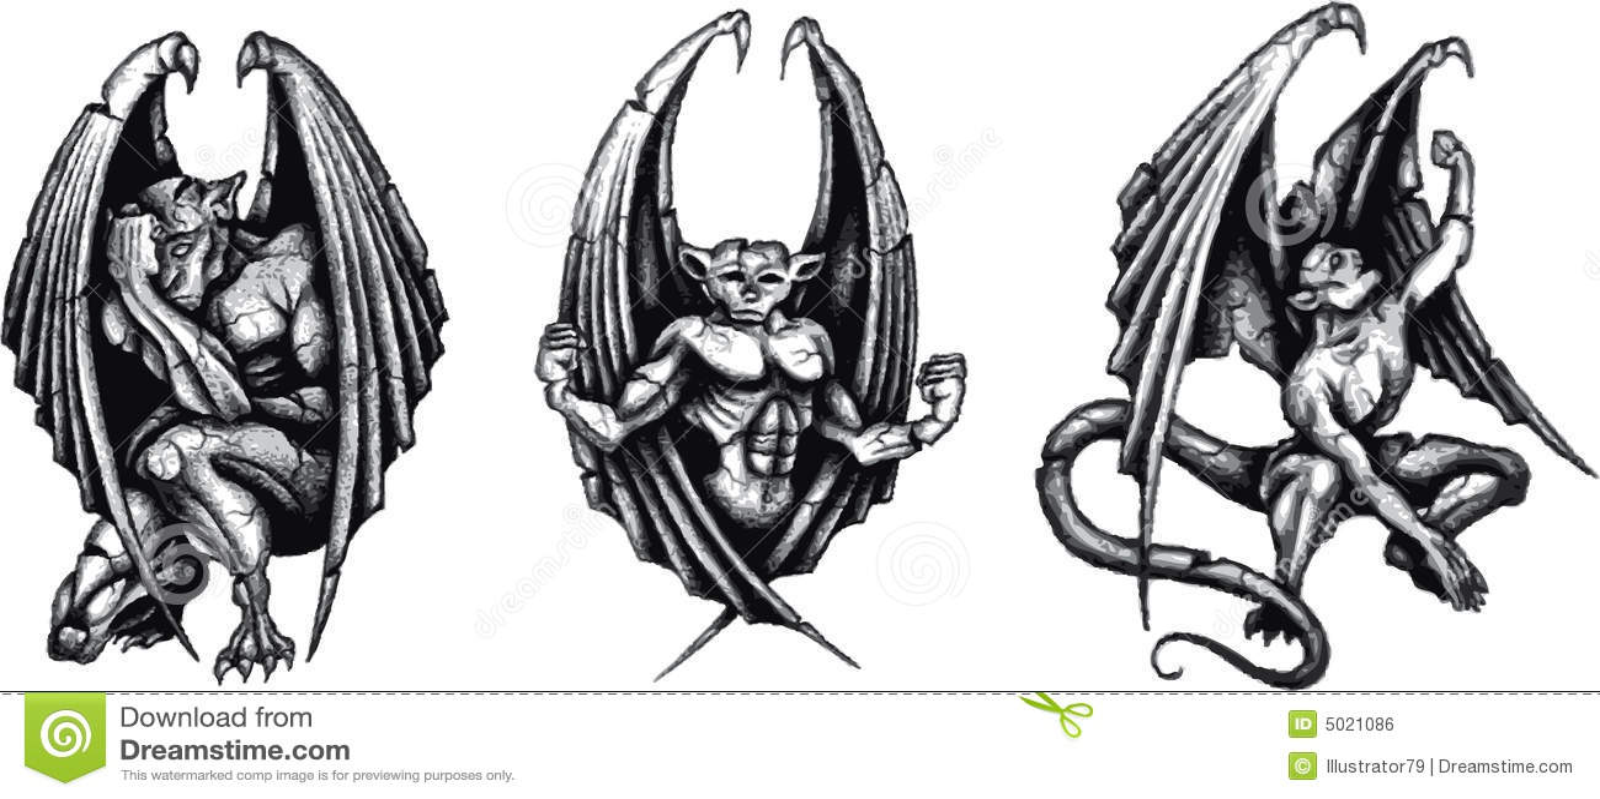 gargoyles stock illustration image of statue tattoo 5021086. Black Bedroom Furniture Sets. Home Design Ideas